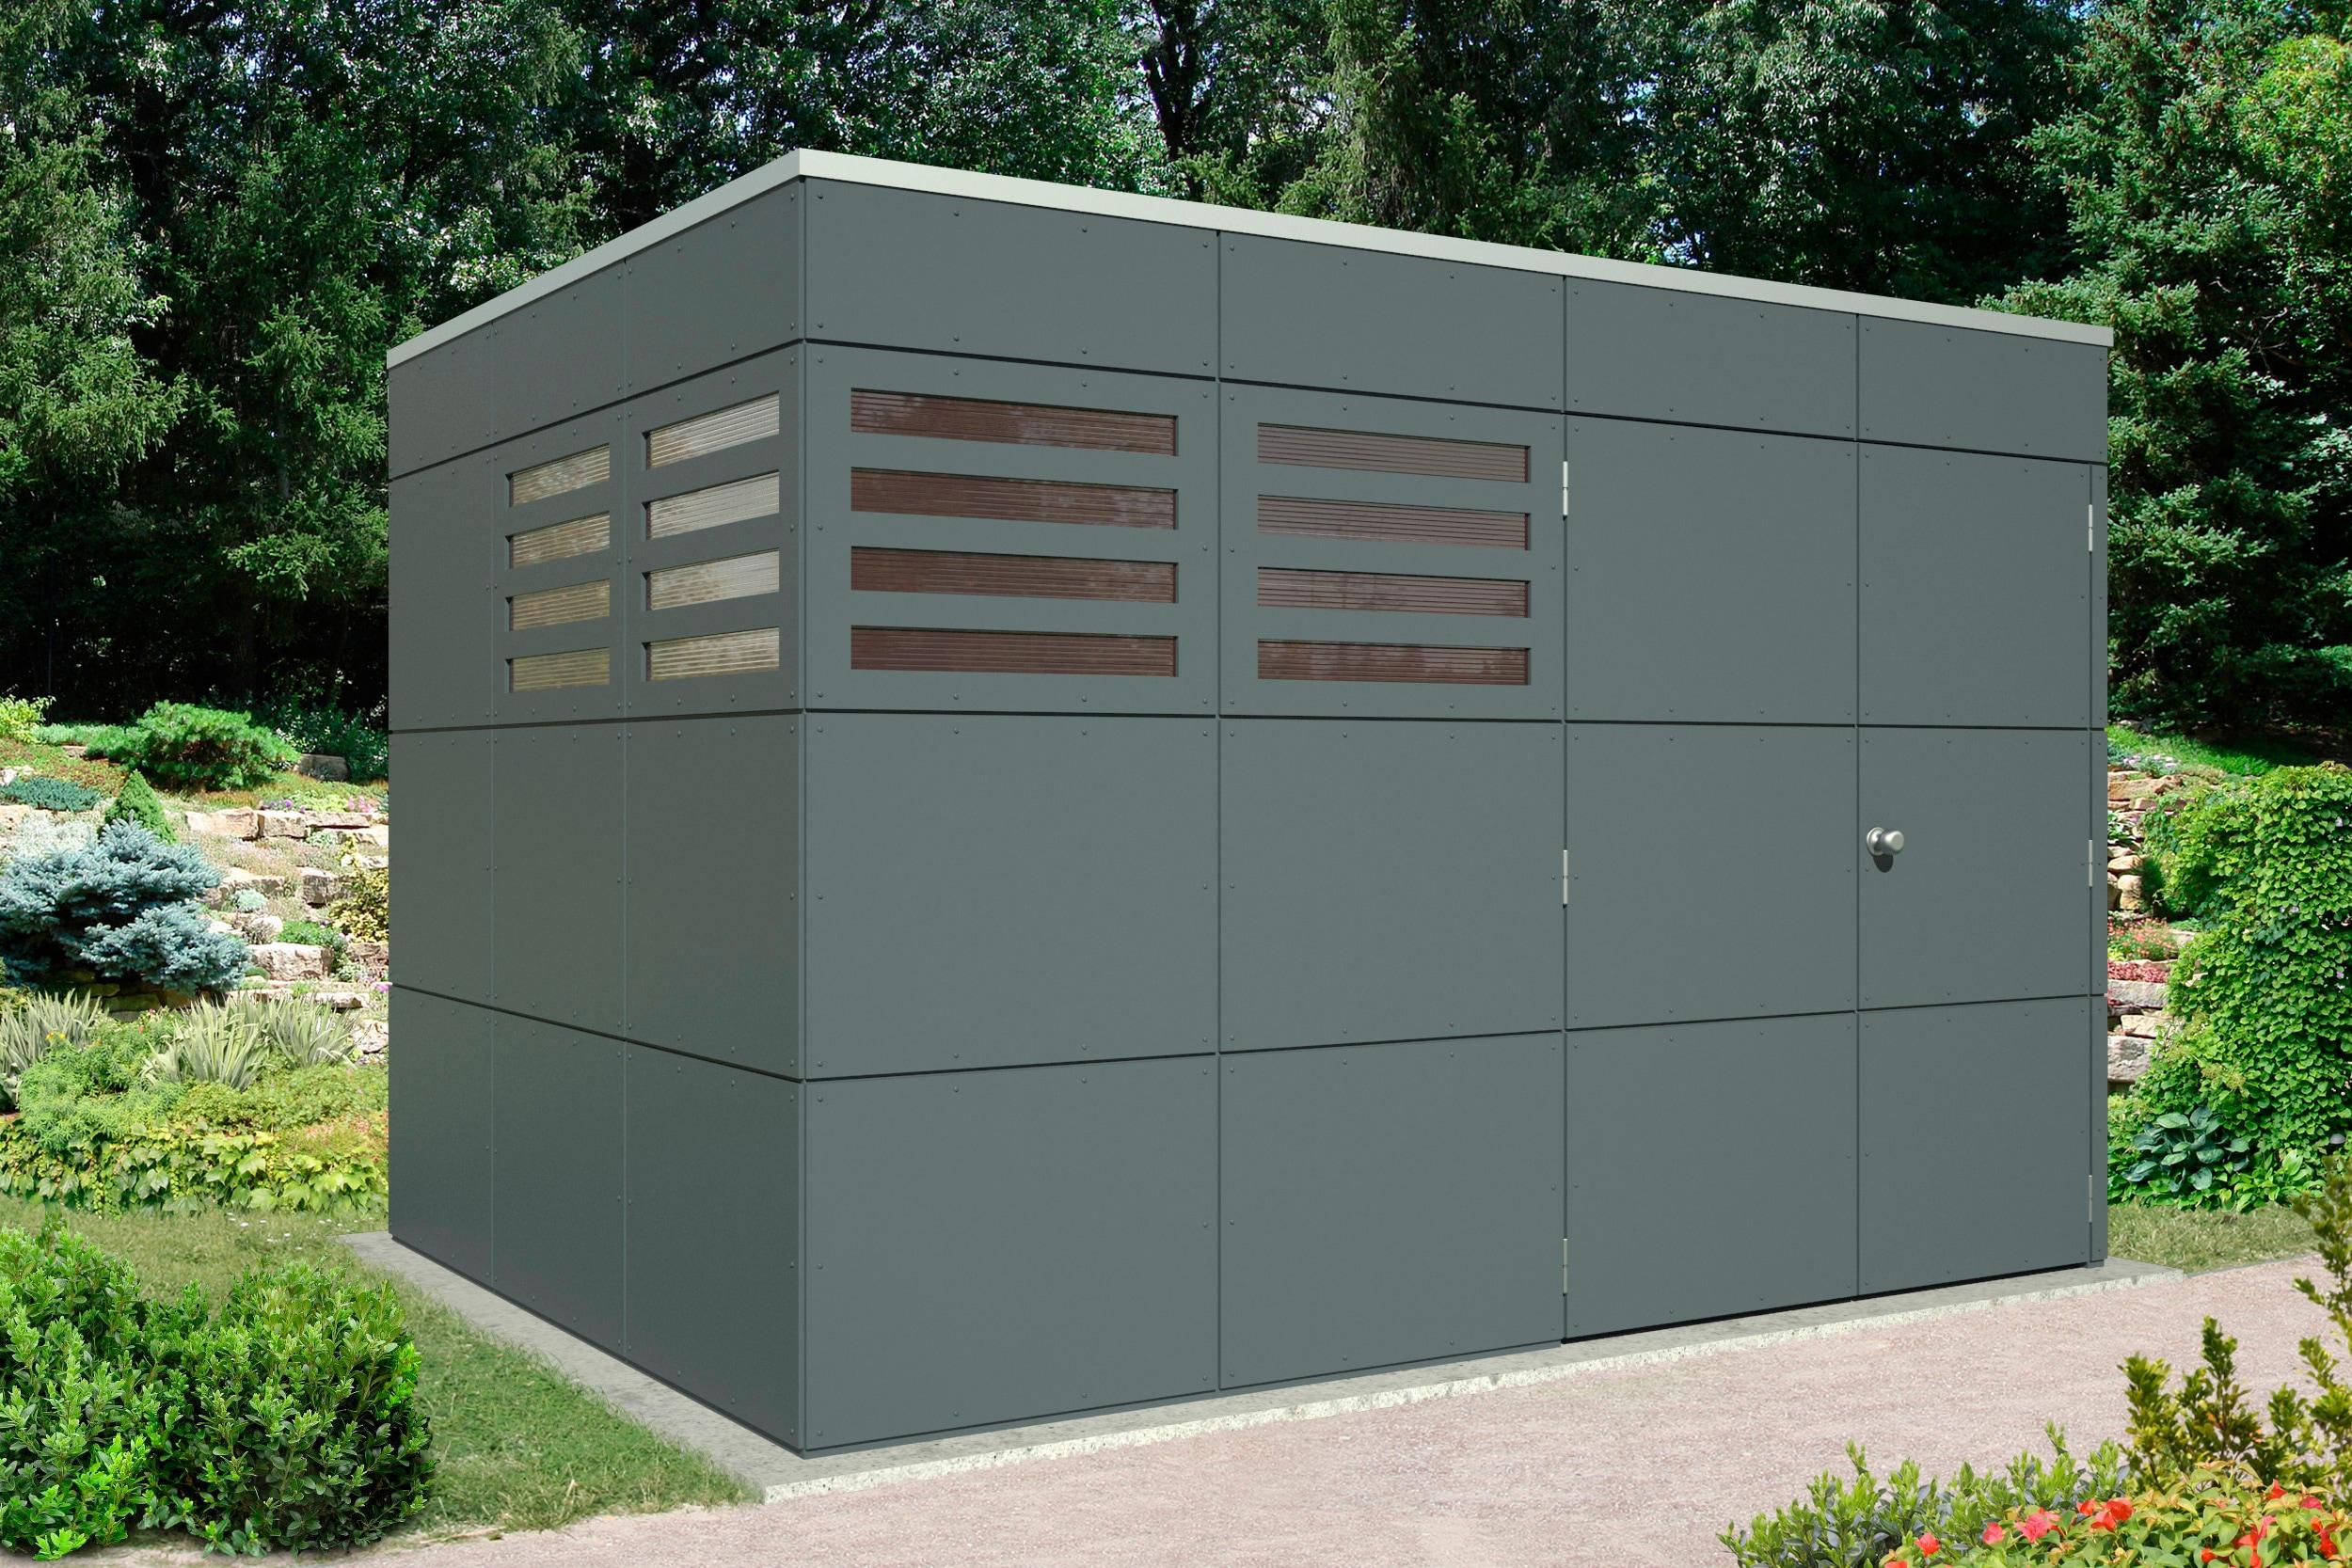 SKANHOLZ Gartenhaus »Brisbane 4«, BxT: 337x253 cm   Garten > Gartenhäuser   Grau   Holz   SKANHOLZ